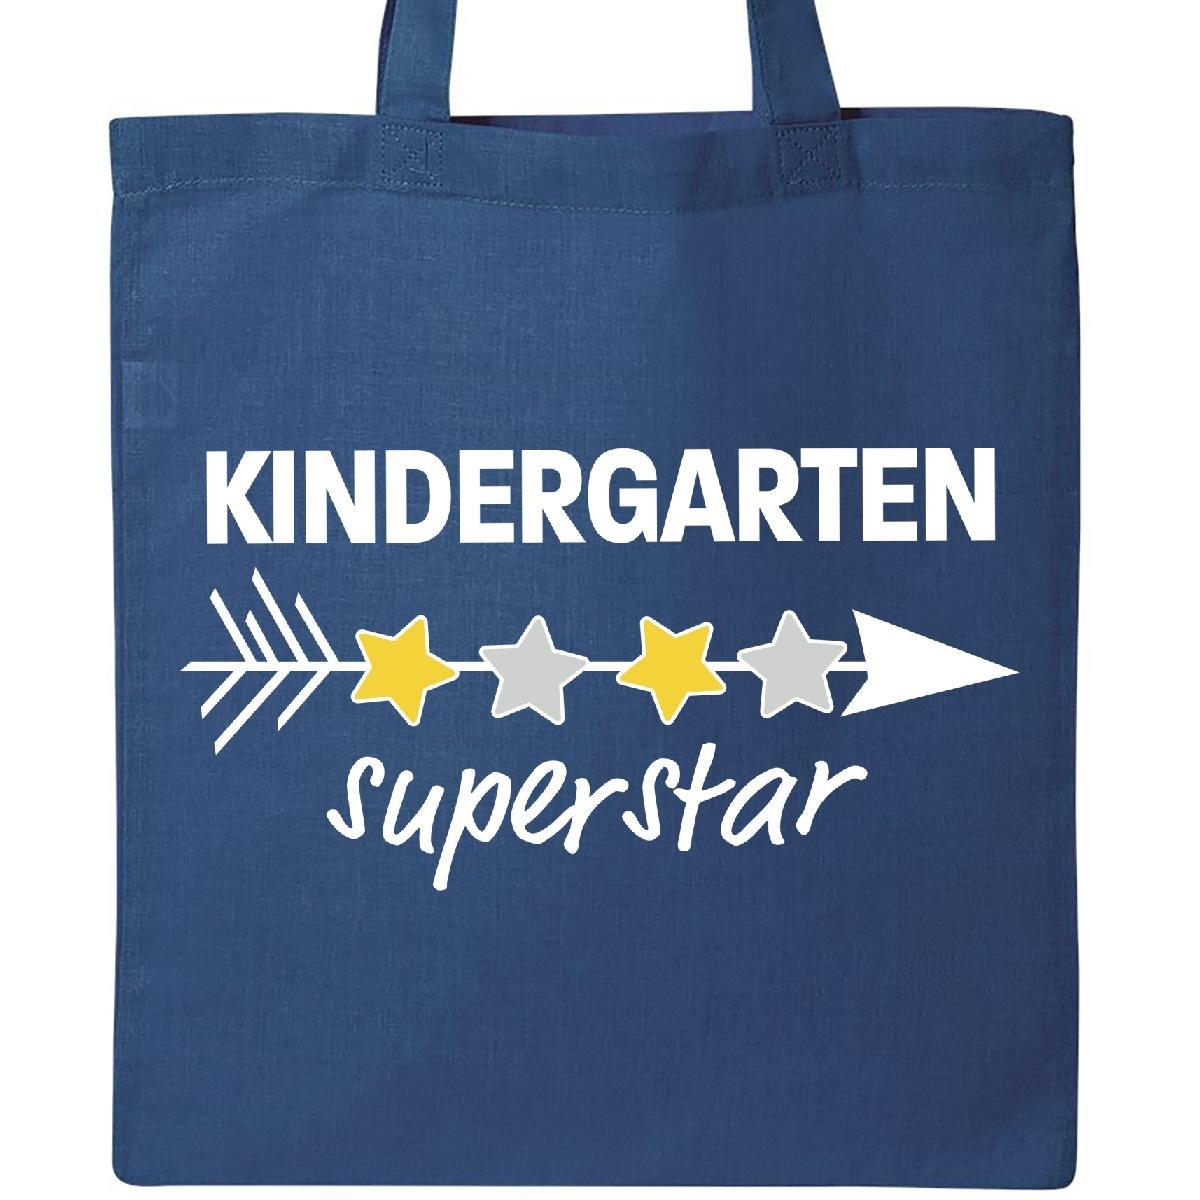 Inktastic幼稚園Superstar with矢印と星トートバッグ One Size ブルー 4331345392  ロイヤルブルー B073GRH8P7